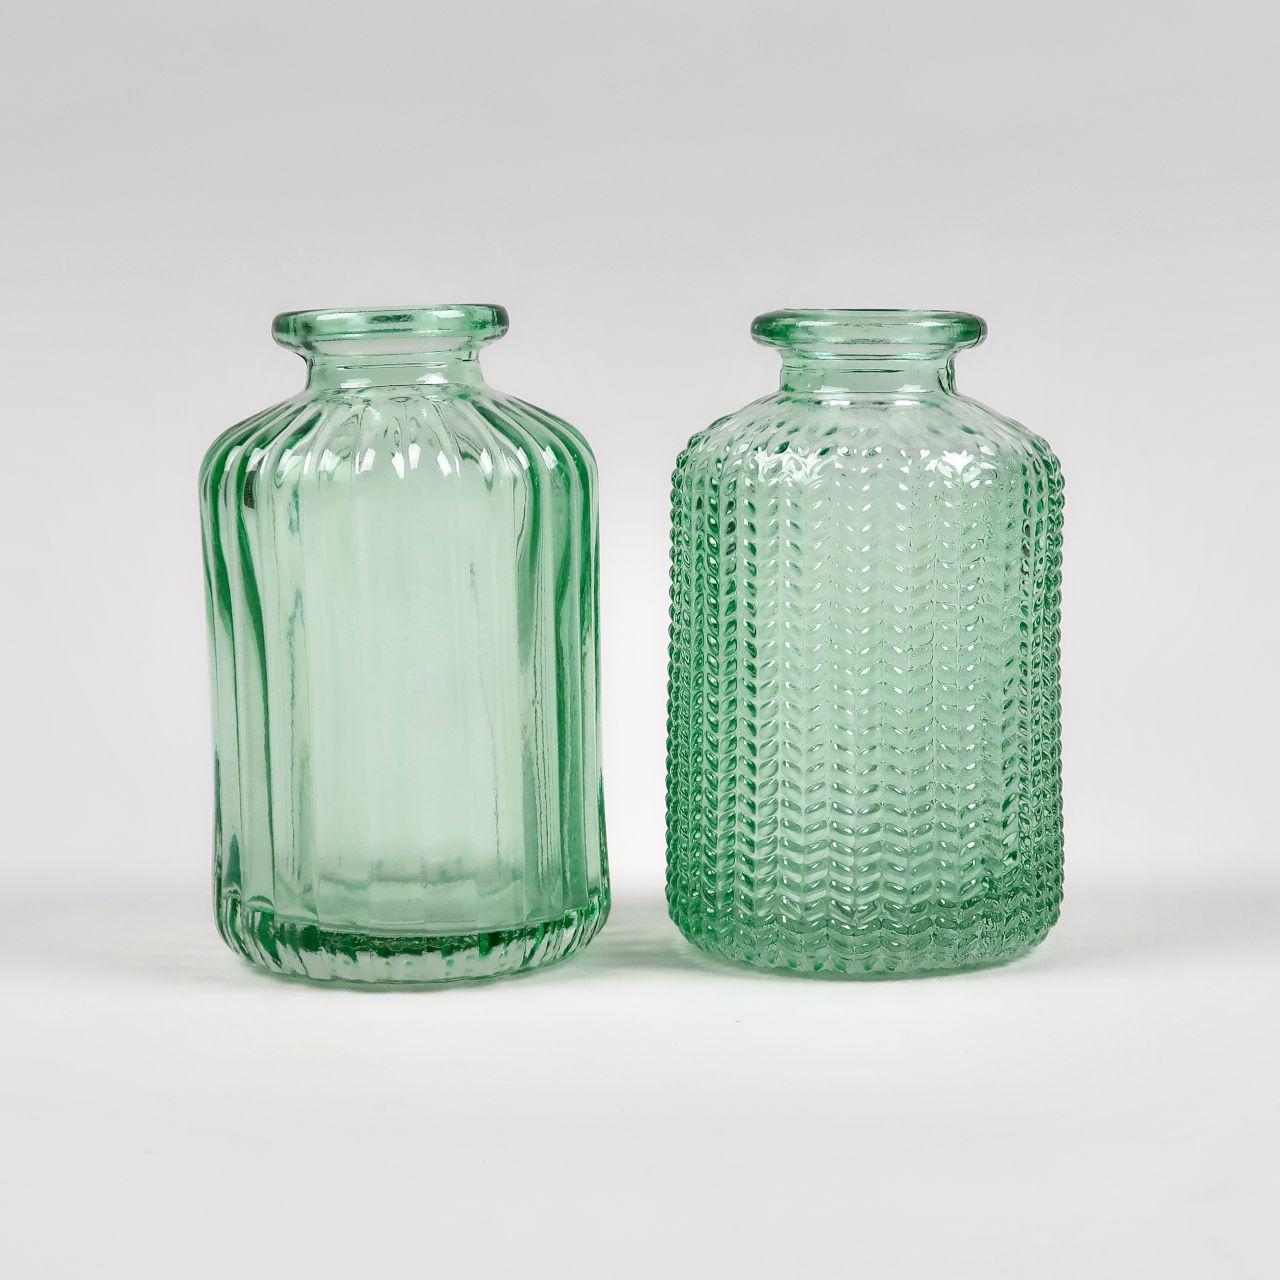 Jazz Bottle Vase - Green